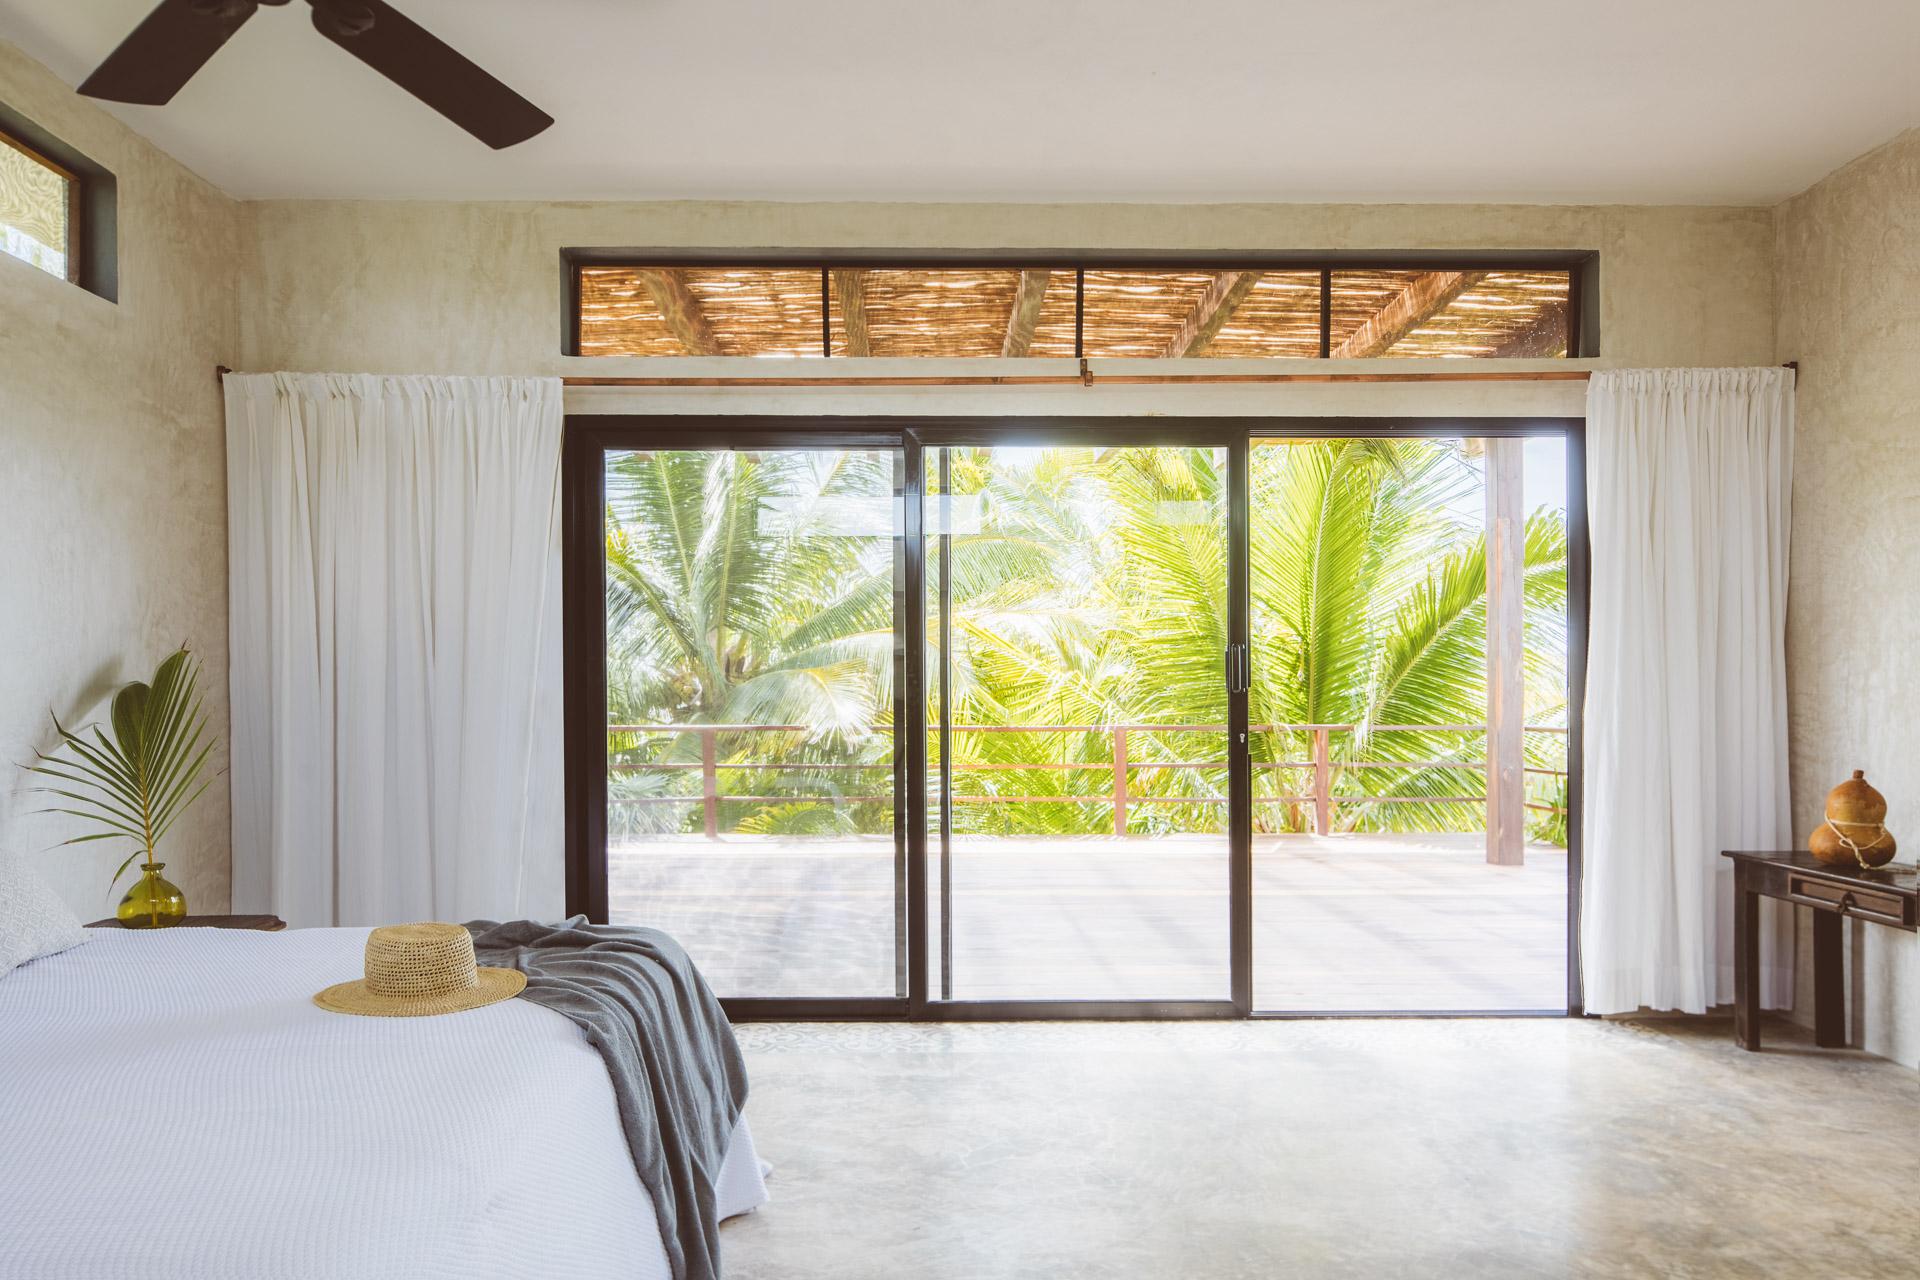 caribbean-hotel-resort-photographer-olas-tulum-mexico--17.jpg